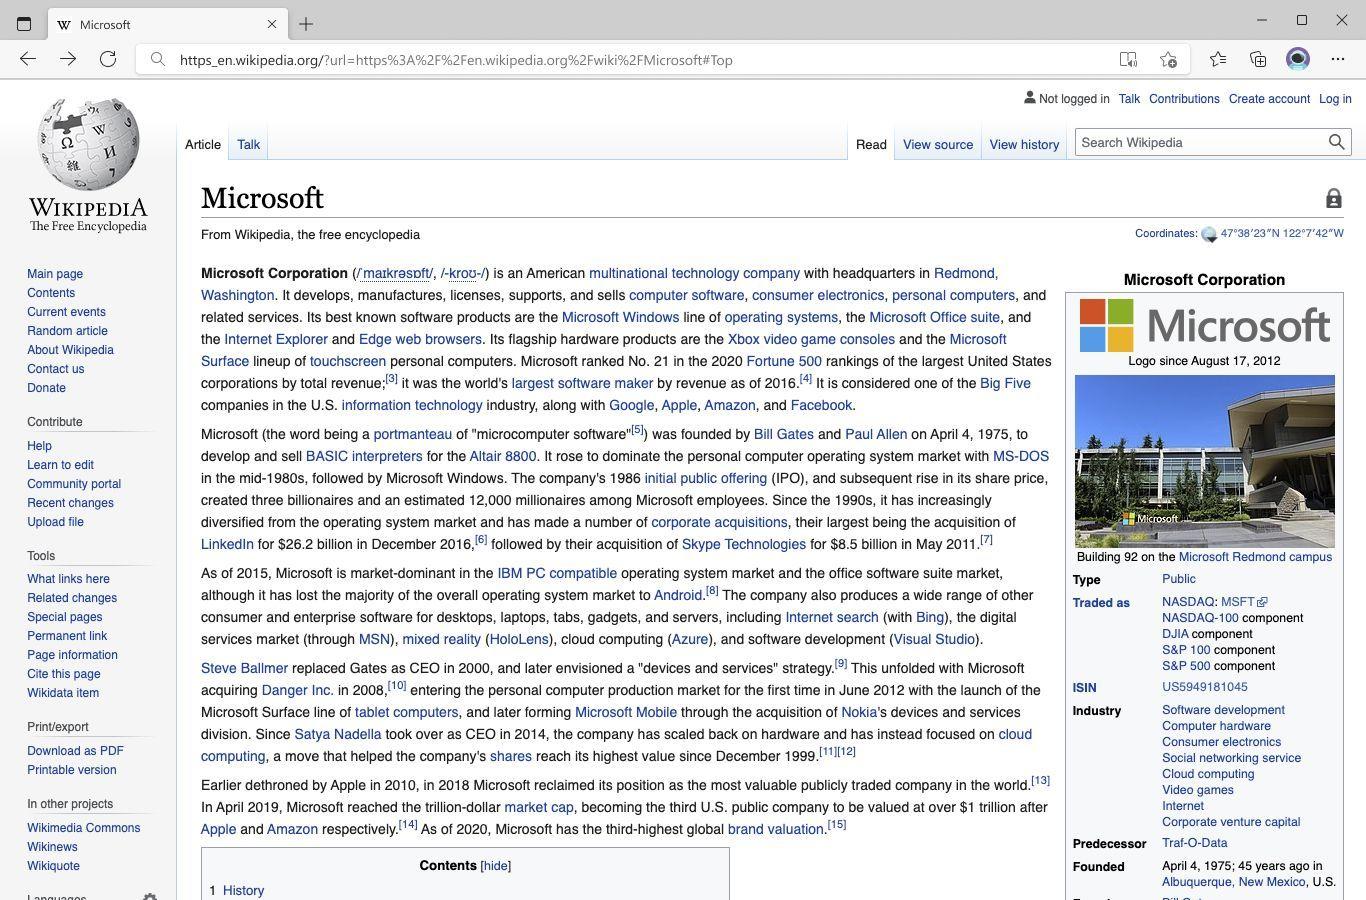 Wikipedia-Artikel über Microsoft in Microsoft Edge